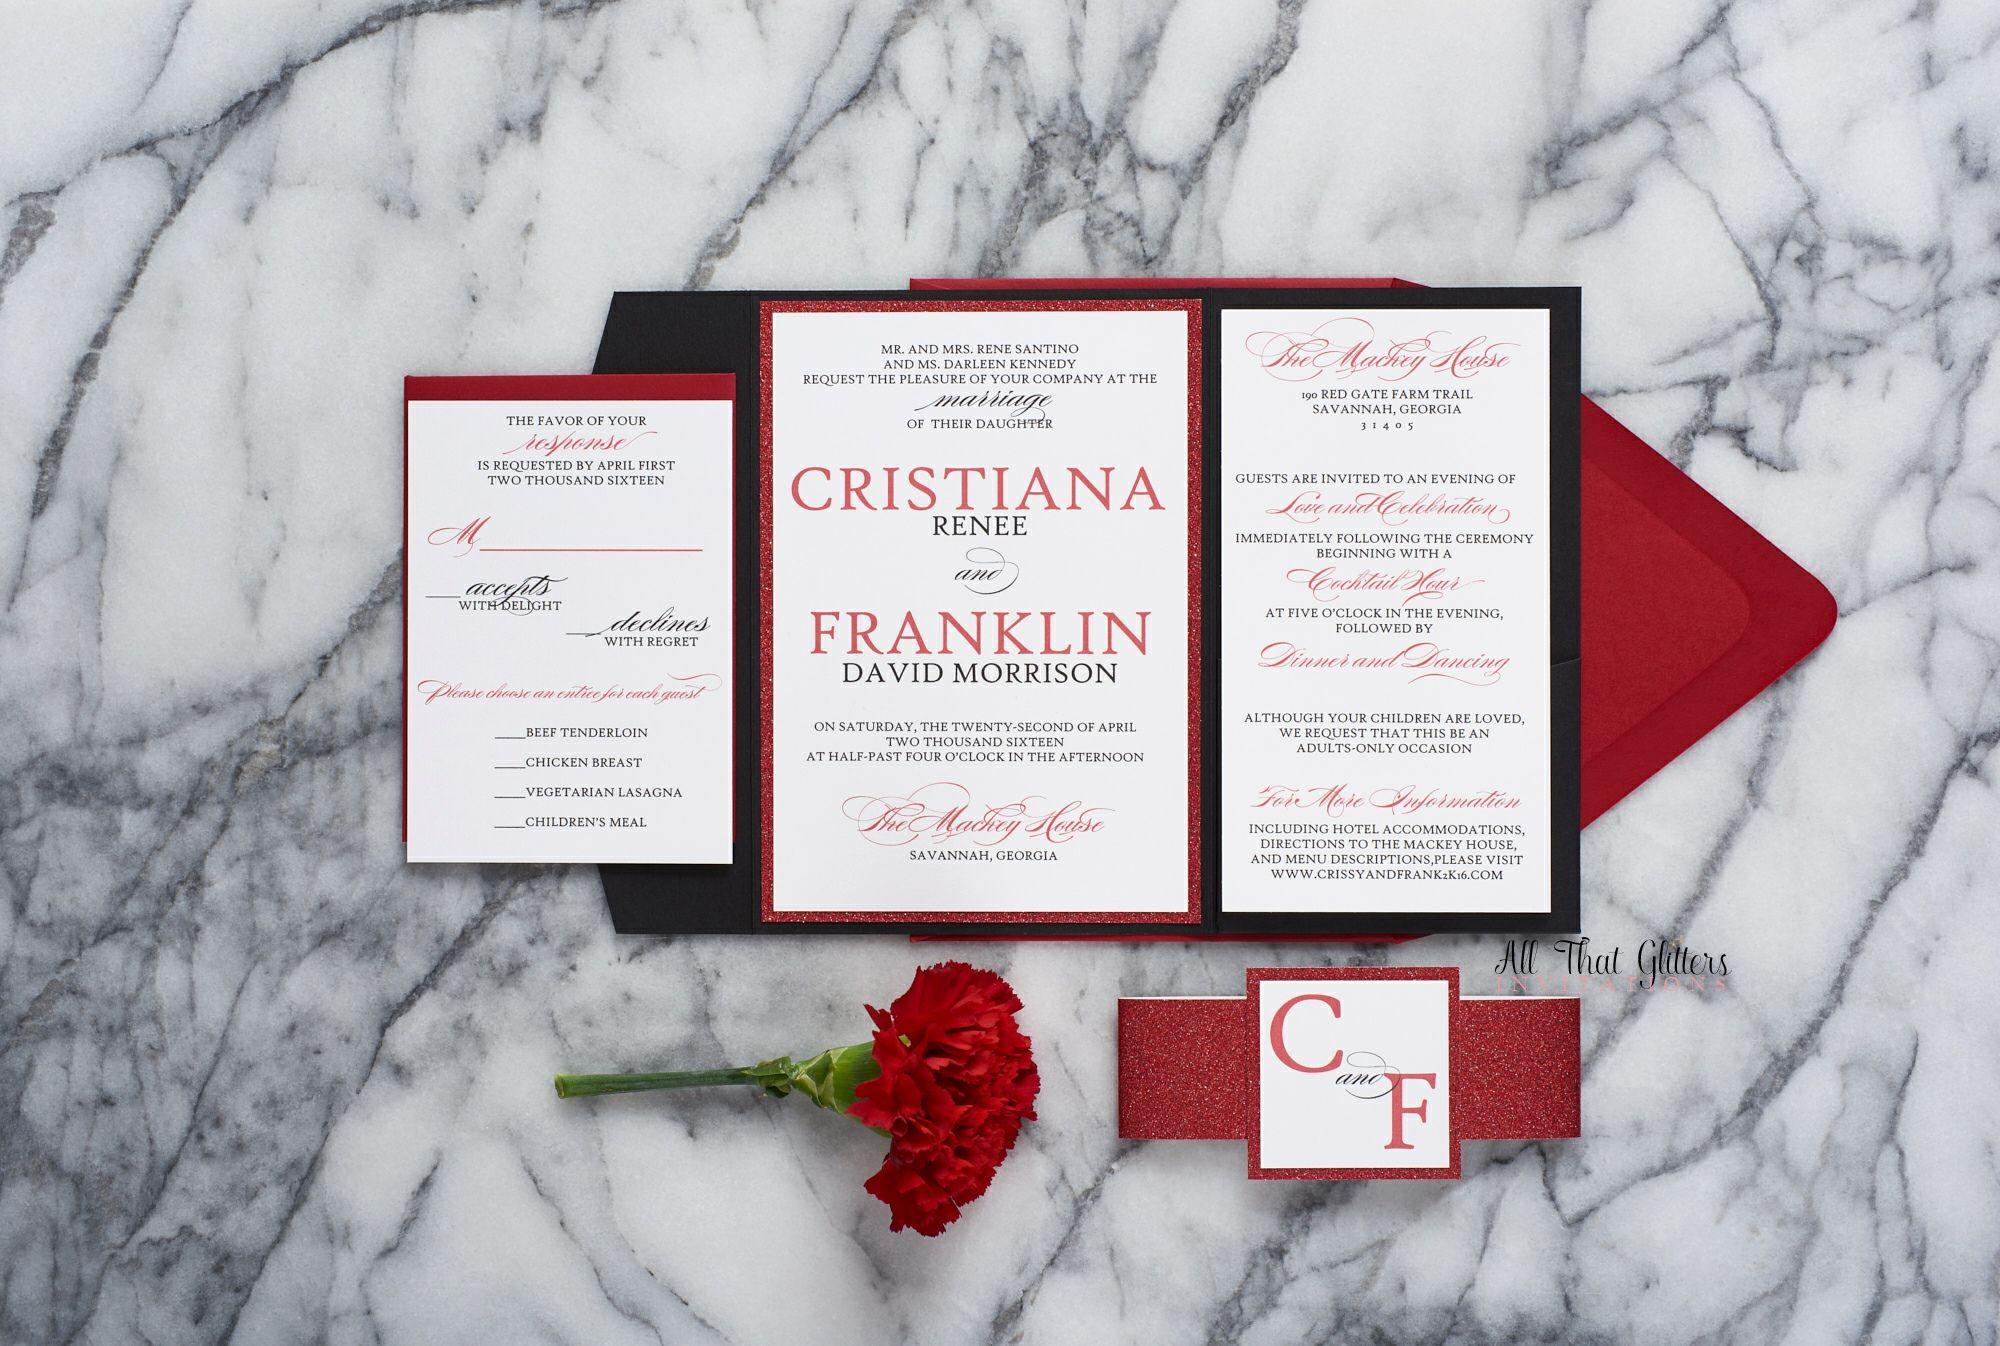 Cristiana Red Wedding Red Wedding Invitations And Elegant Wedding